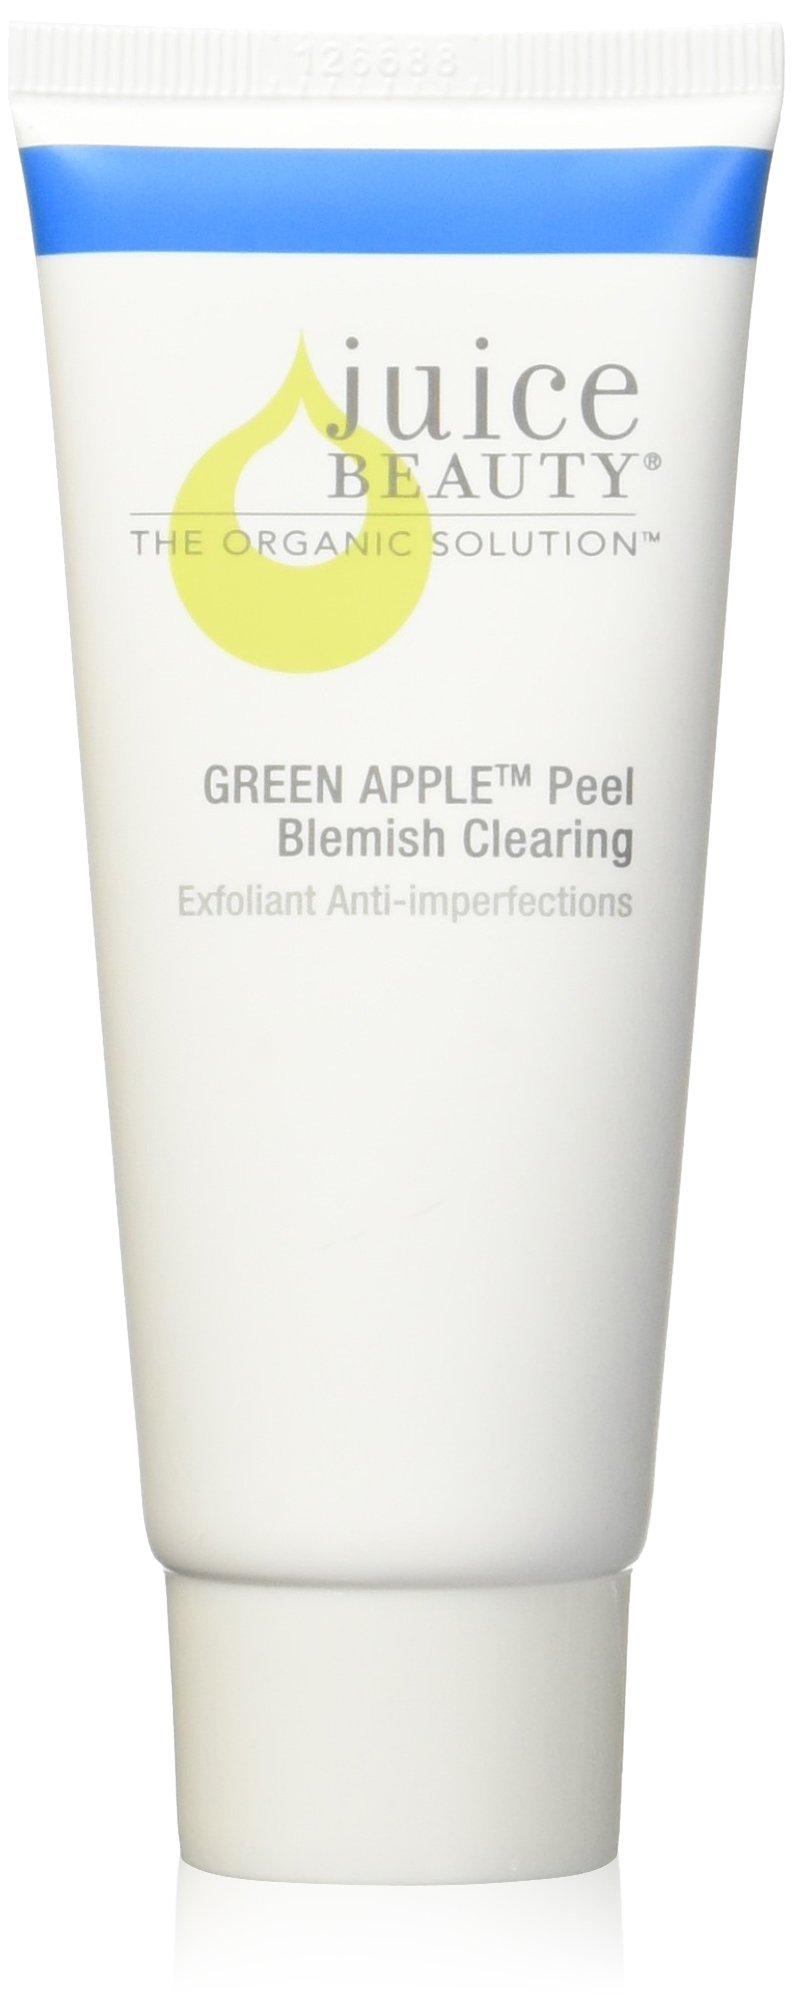 Juice Beauty Blemish Clearing Peel, 2 fl. oz.